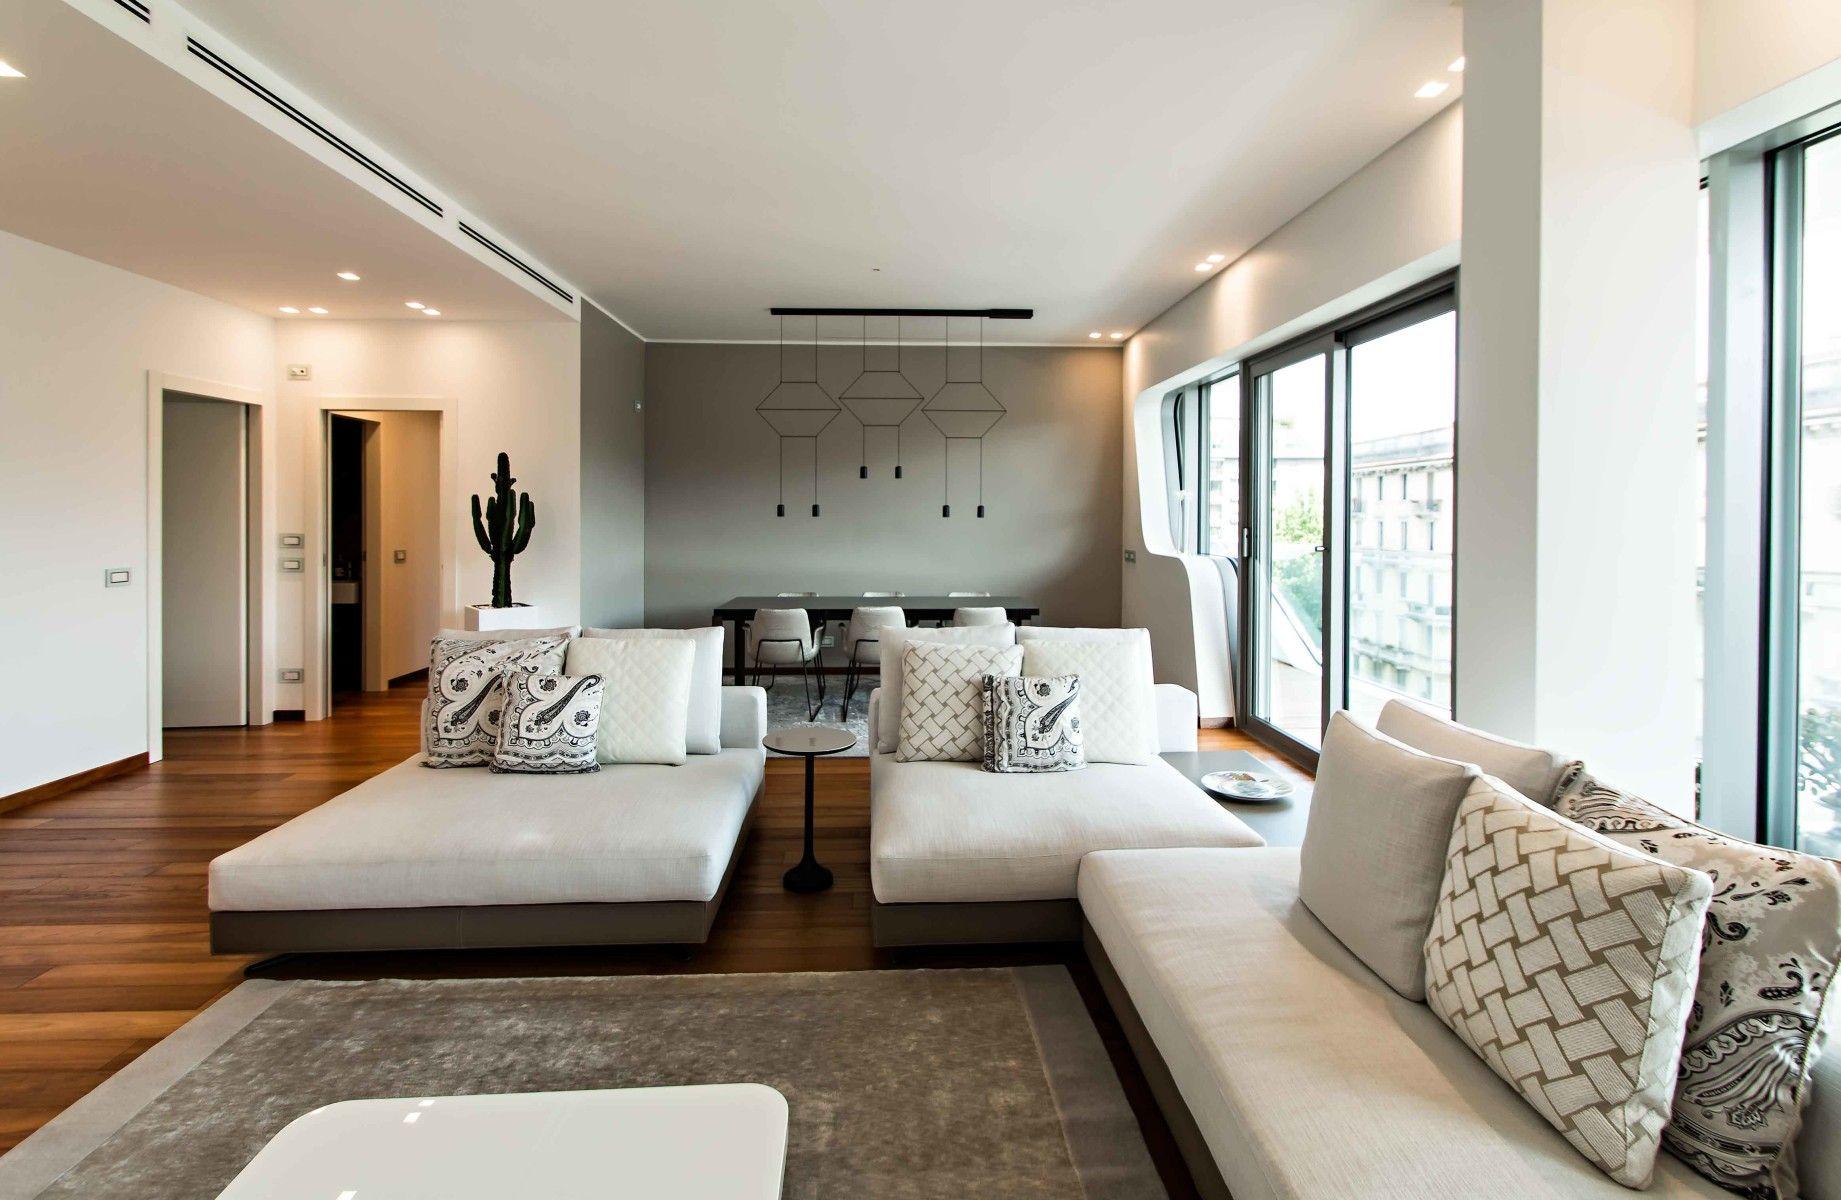 Abitazioe privat citylife zahahadid milano by for Interior lighting residential